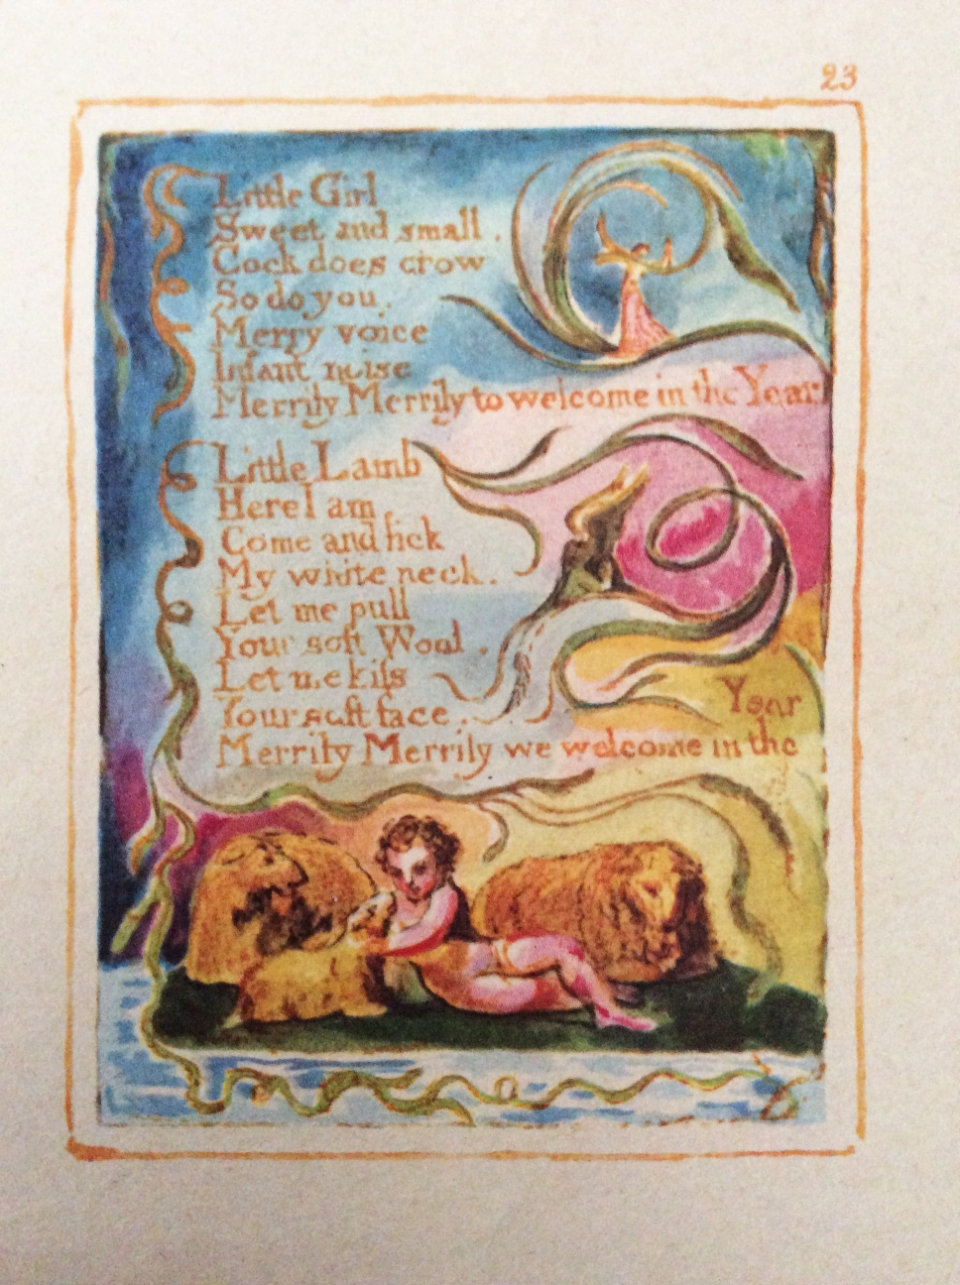 William-Blake-Songs-of-Innocence-Illustration-11